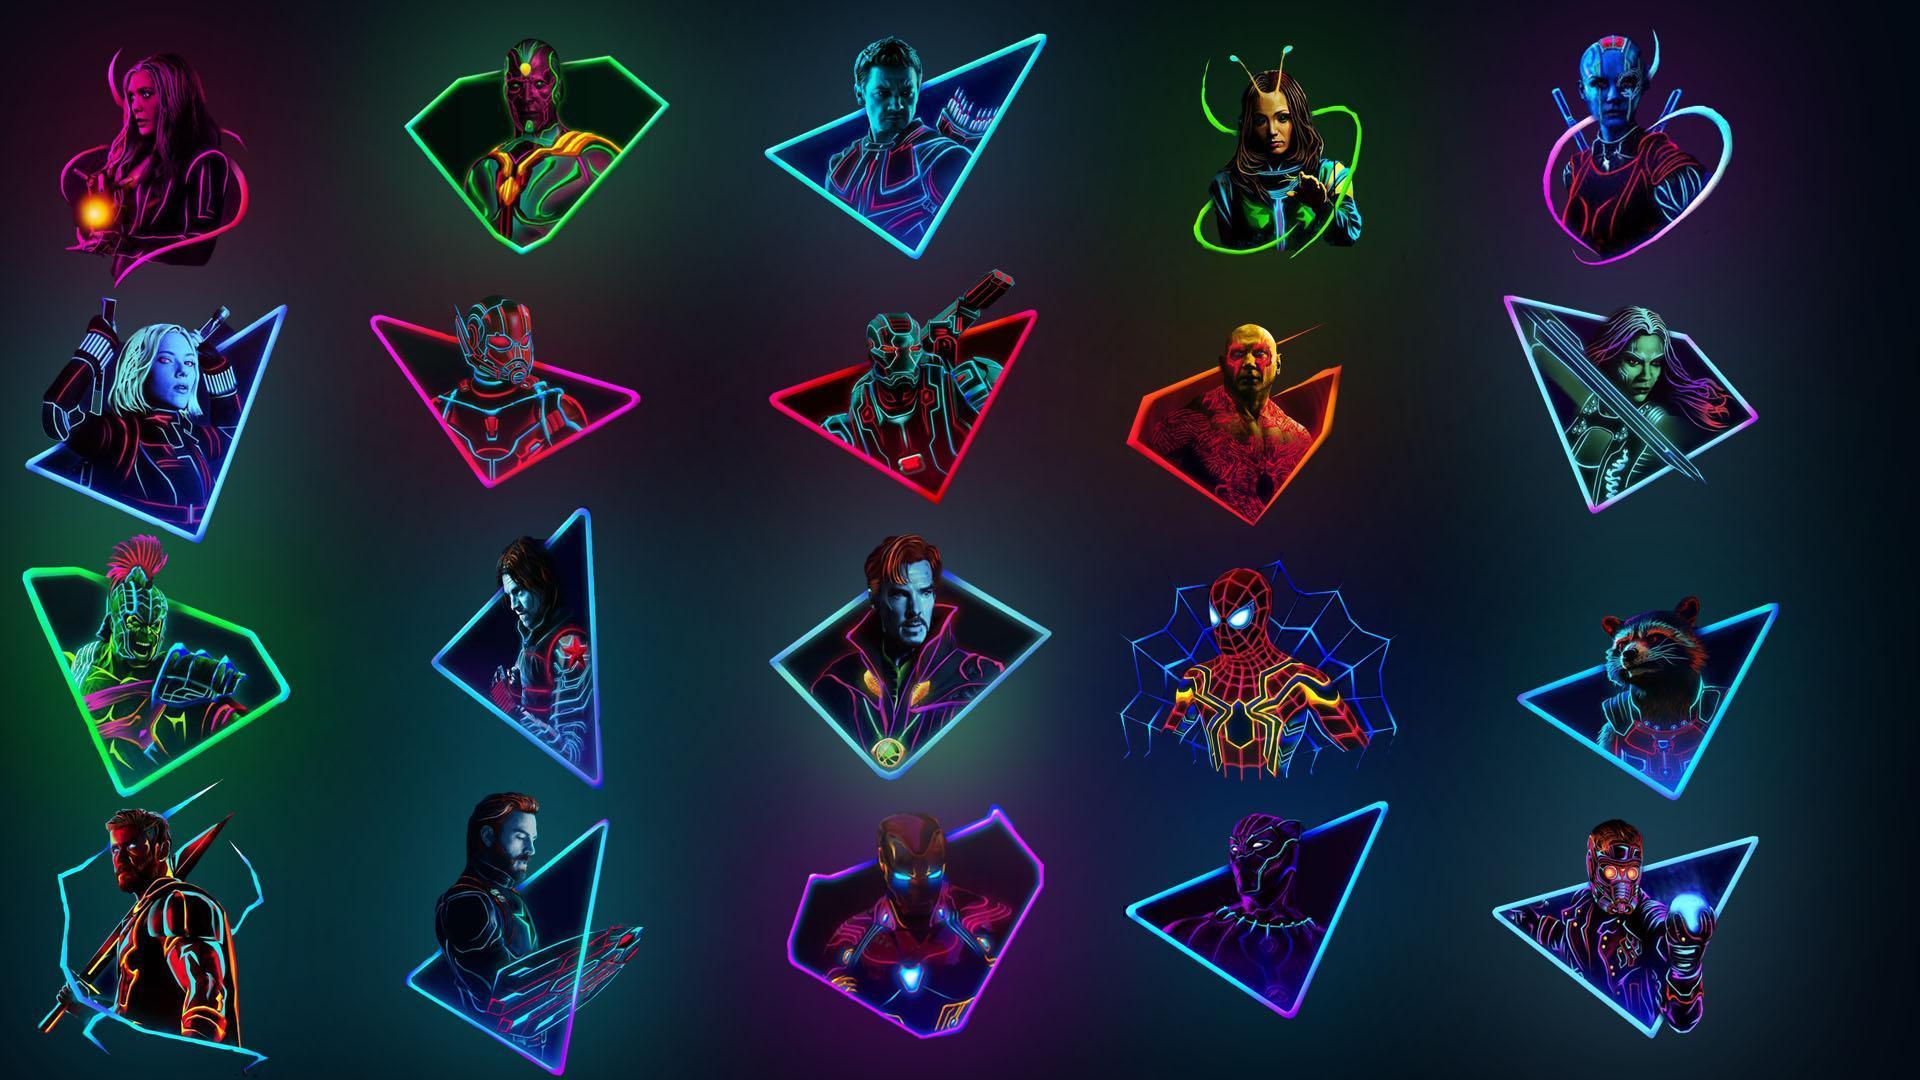 Neon Art Wallpapers Top Free Neon Art Backgrounds Wallpaperaccess